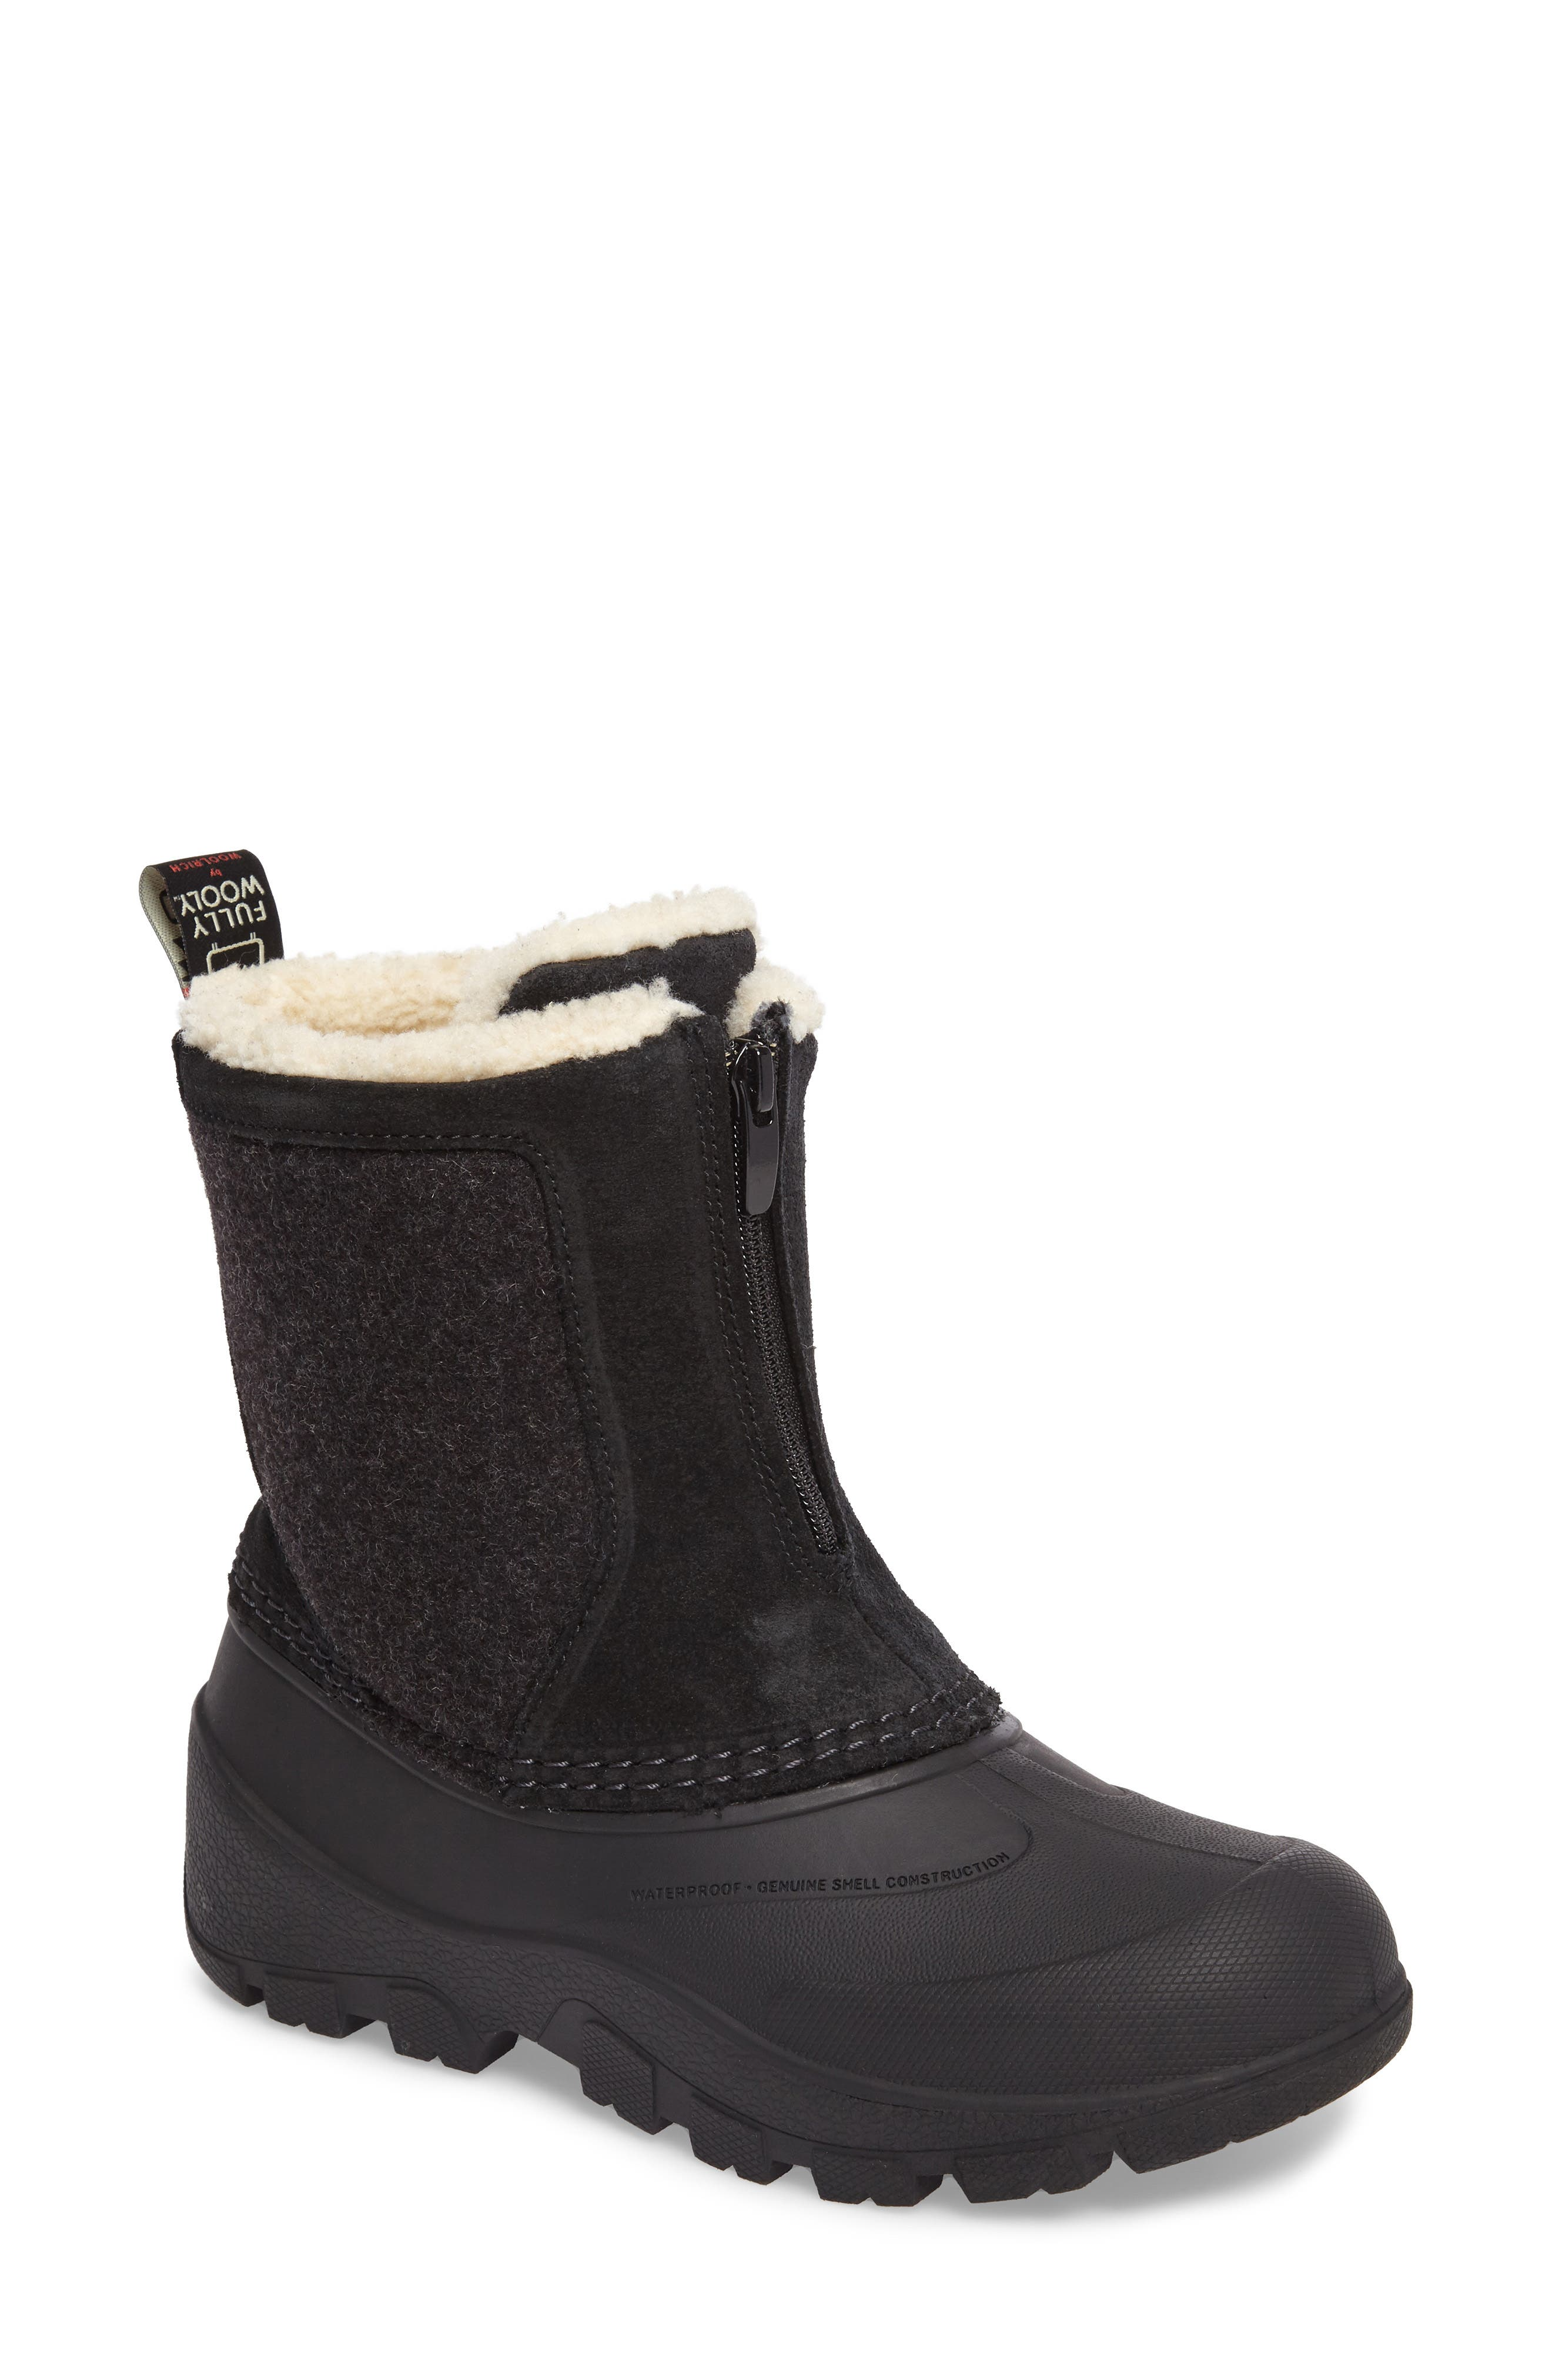 Woolrich Fully Wooly Icecat Waterproof Insulated Winter Boot (Women)